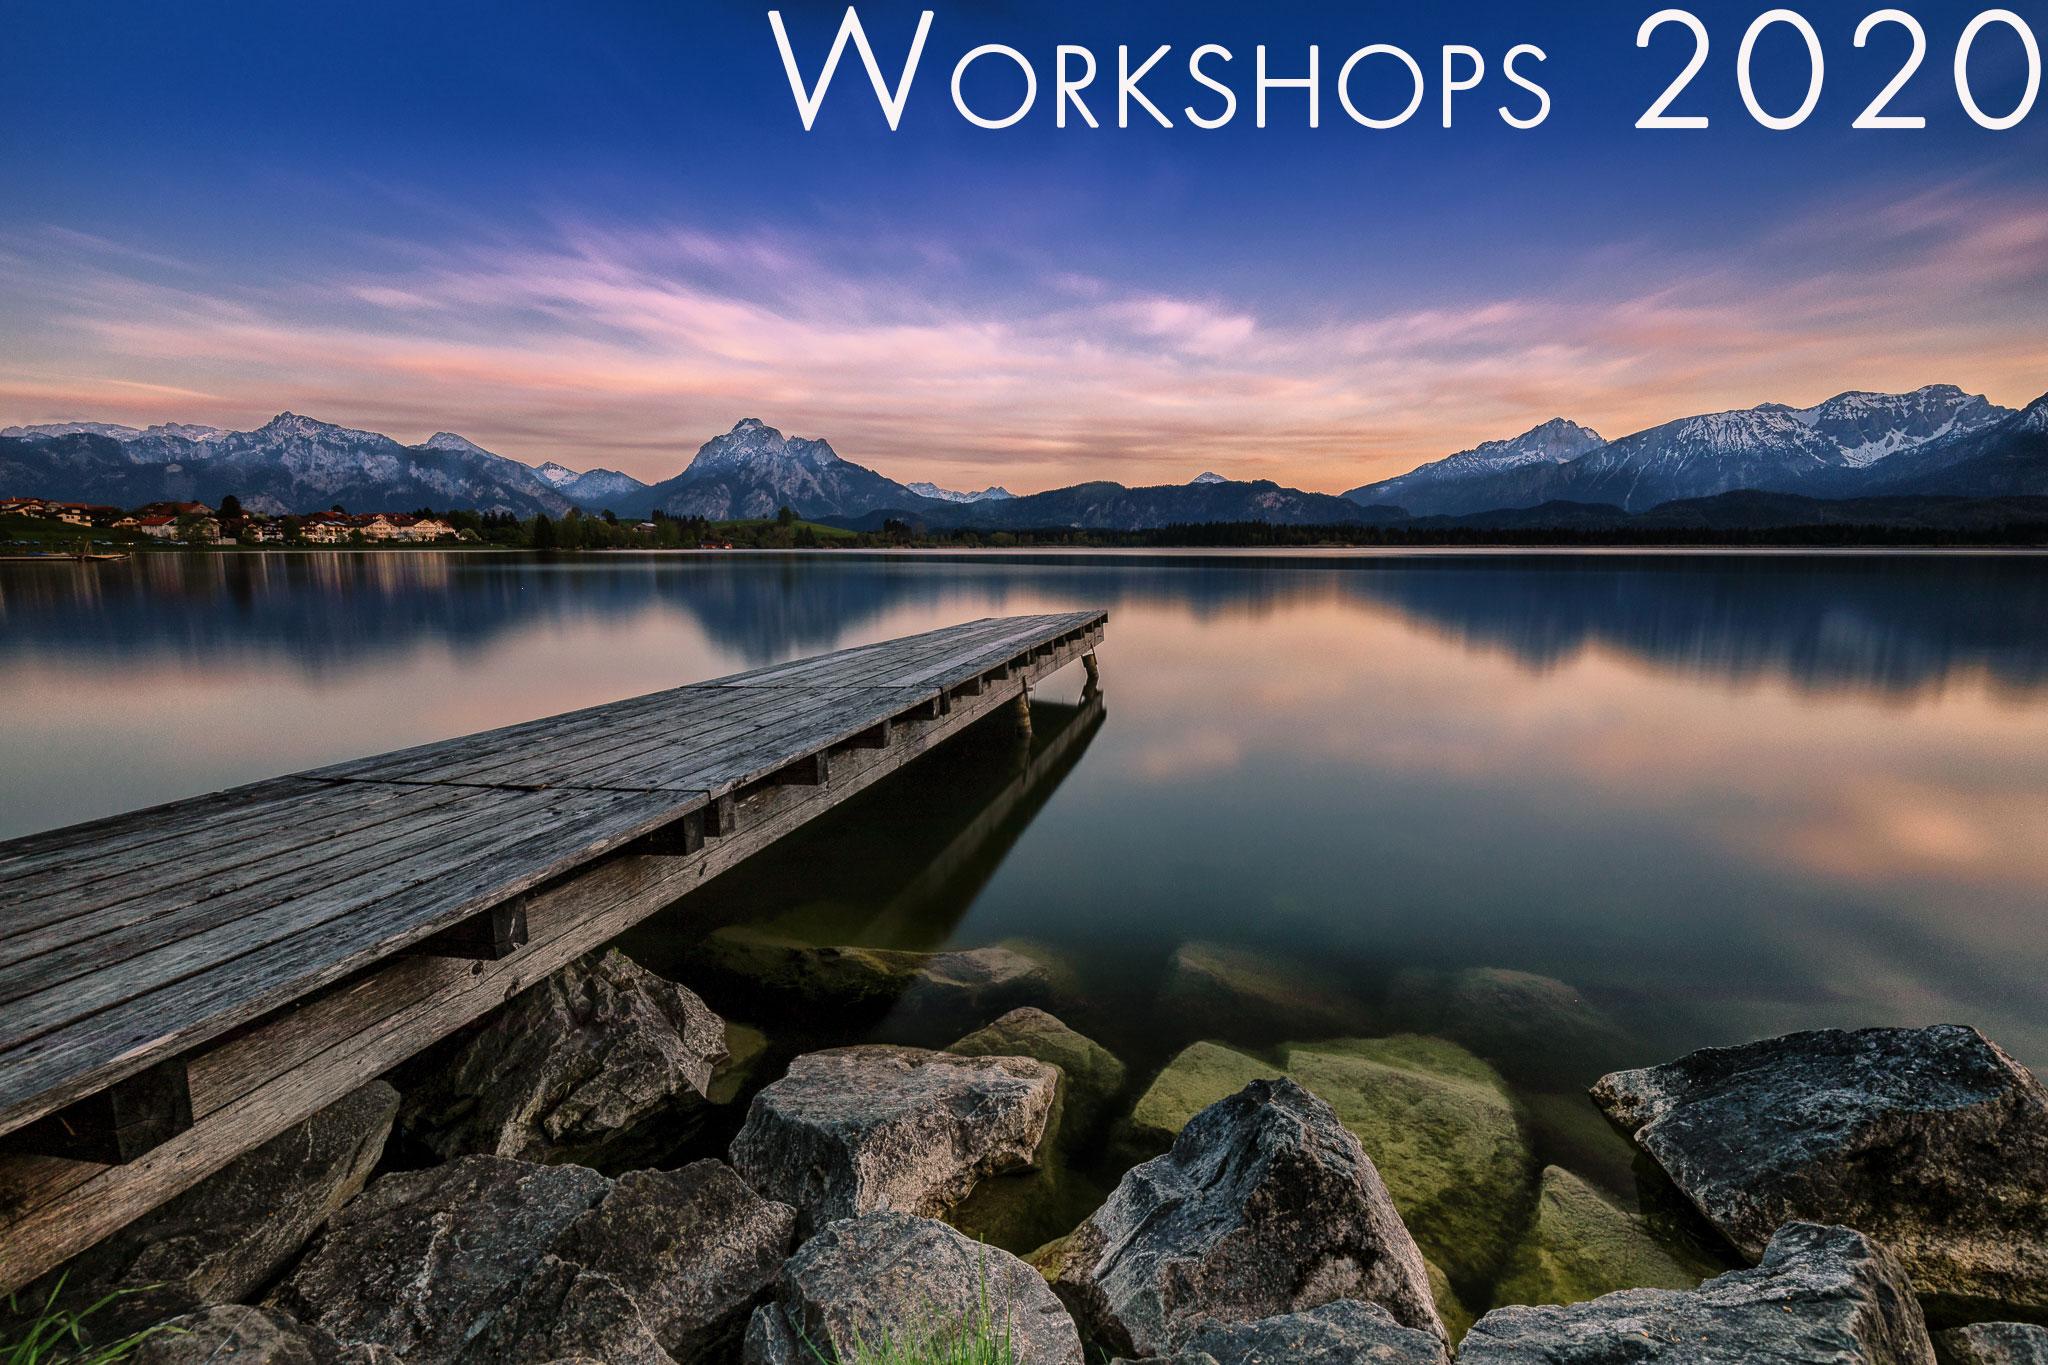 Fotoworkshops 2020